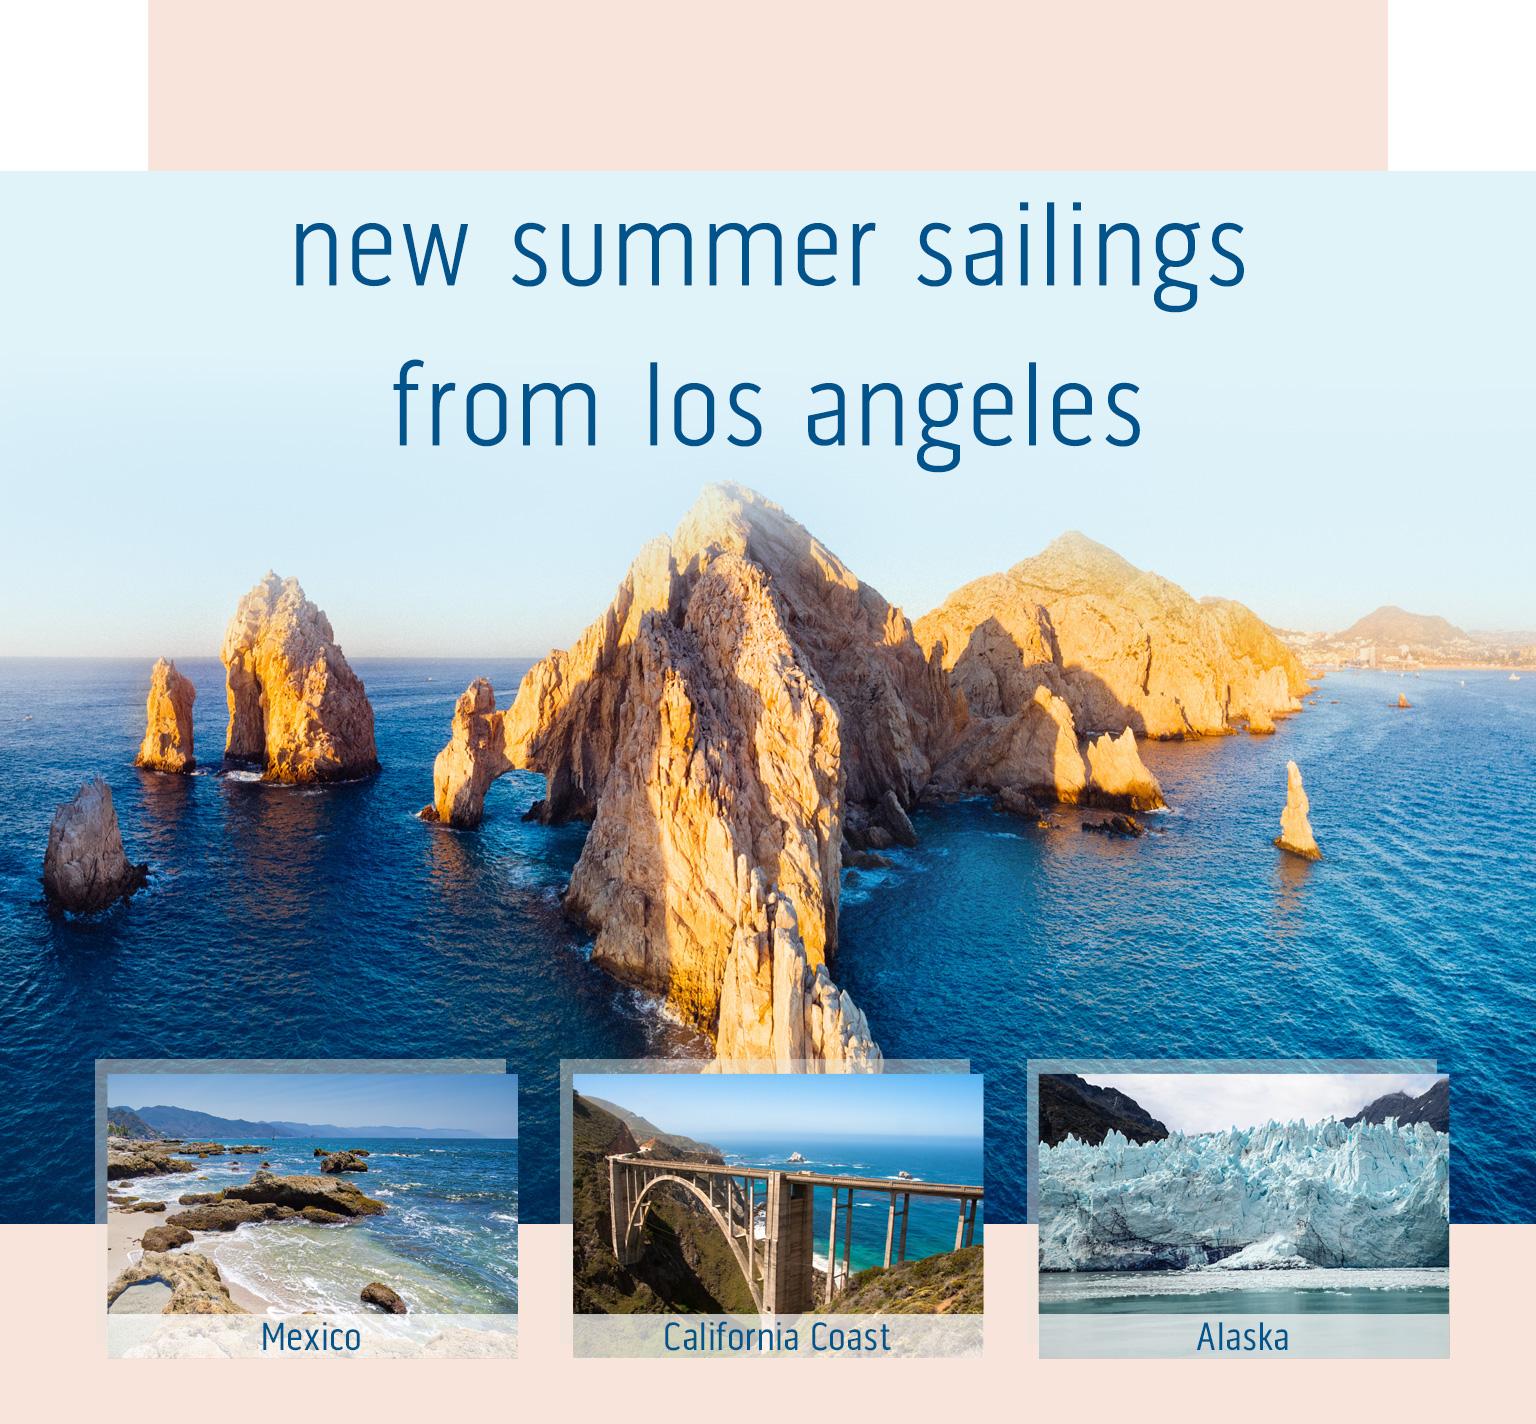 Princess Cruises new summer sailings from Los Angeles